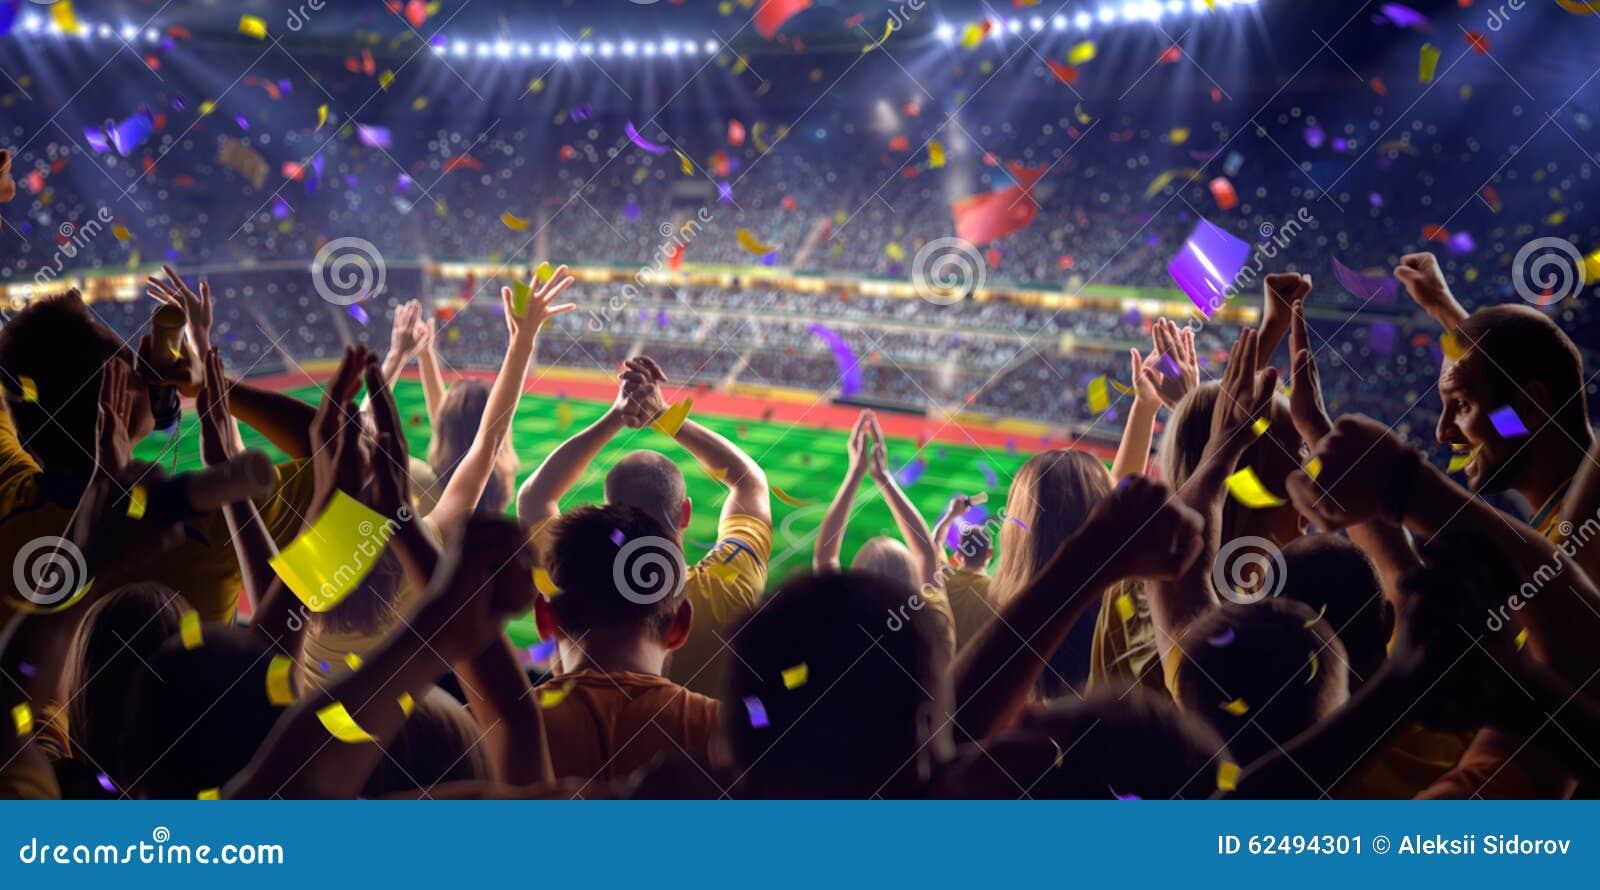 Fans on stadium game panorama view